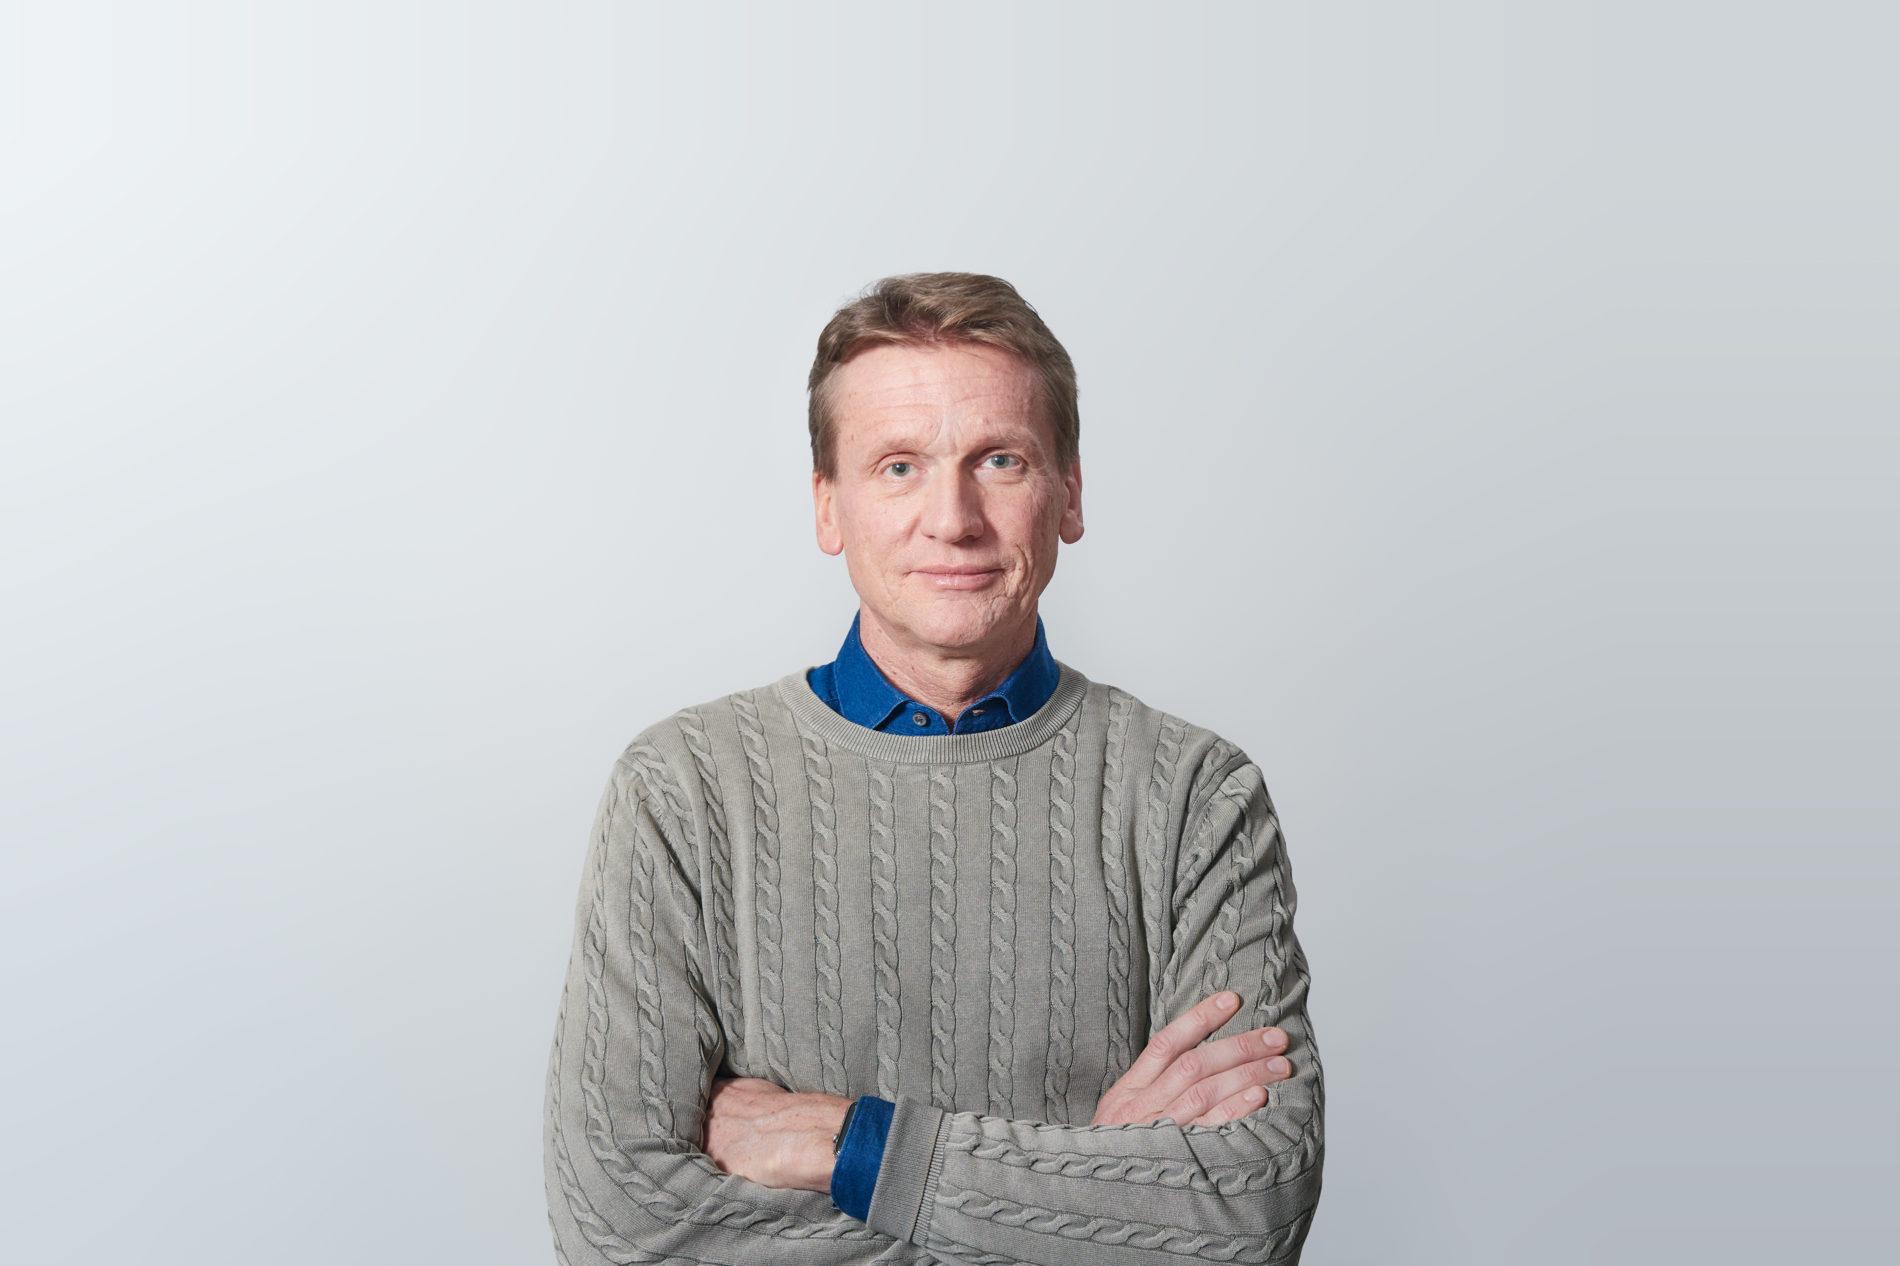 Sören Sandell